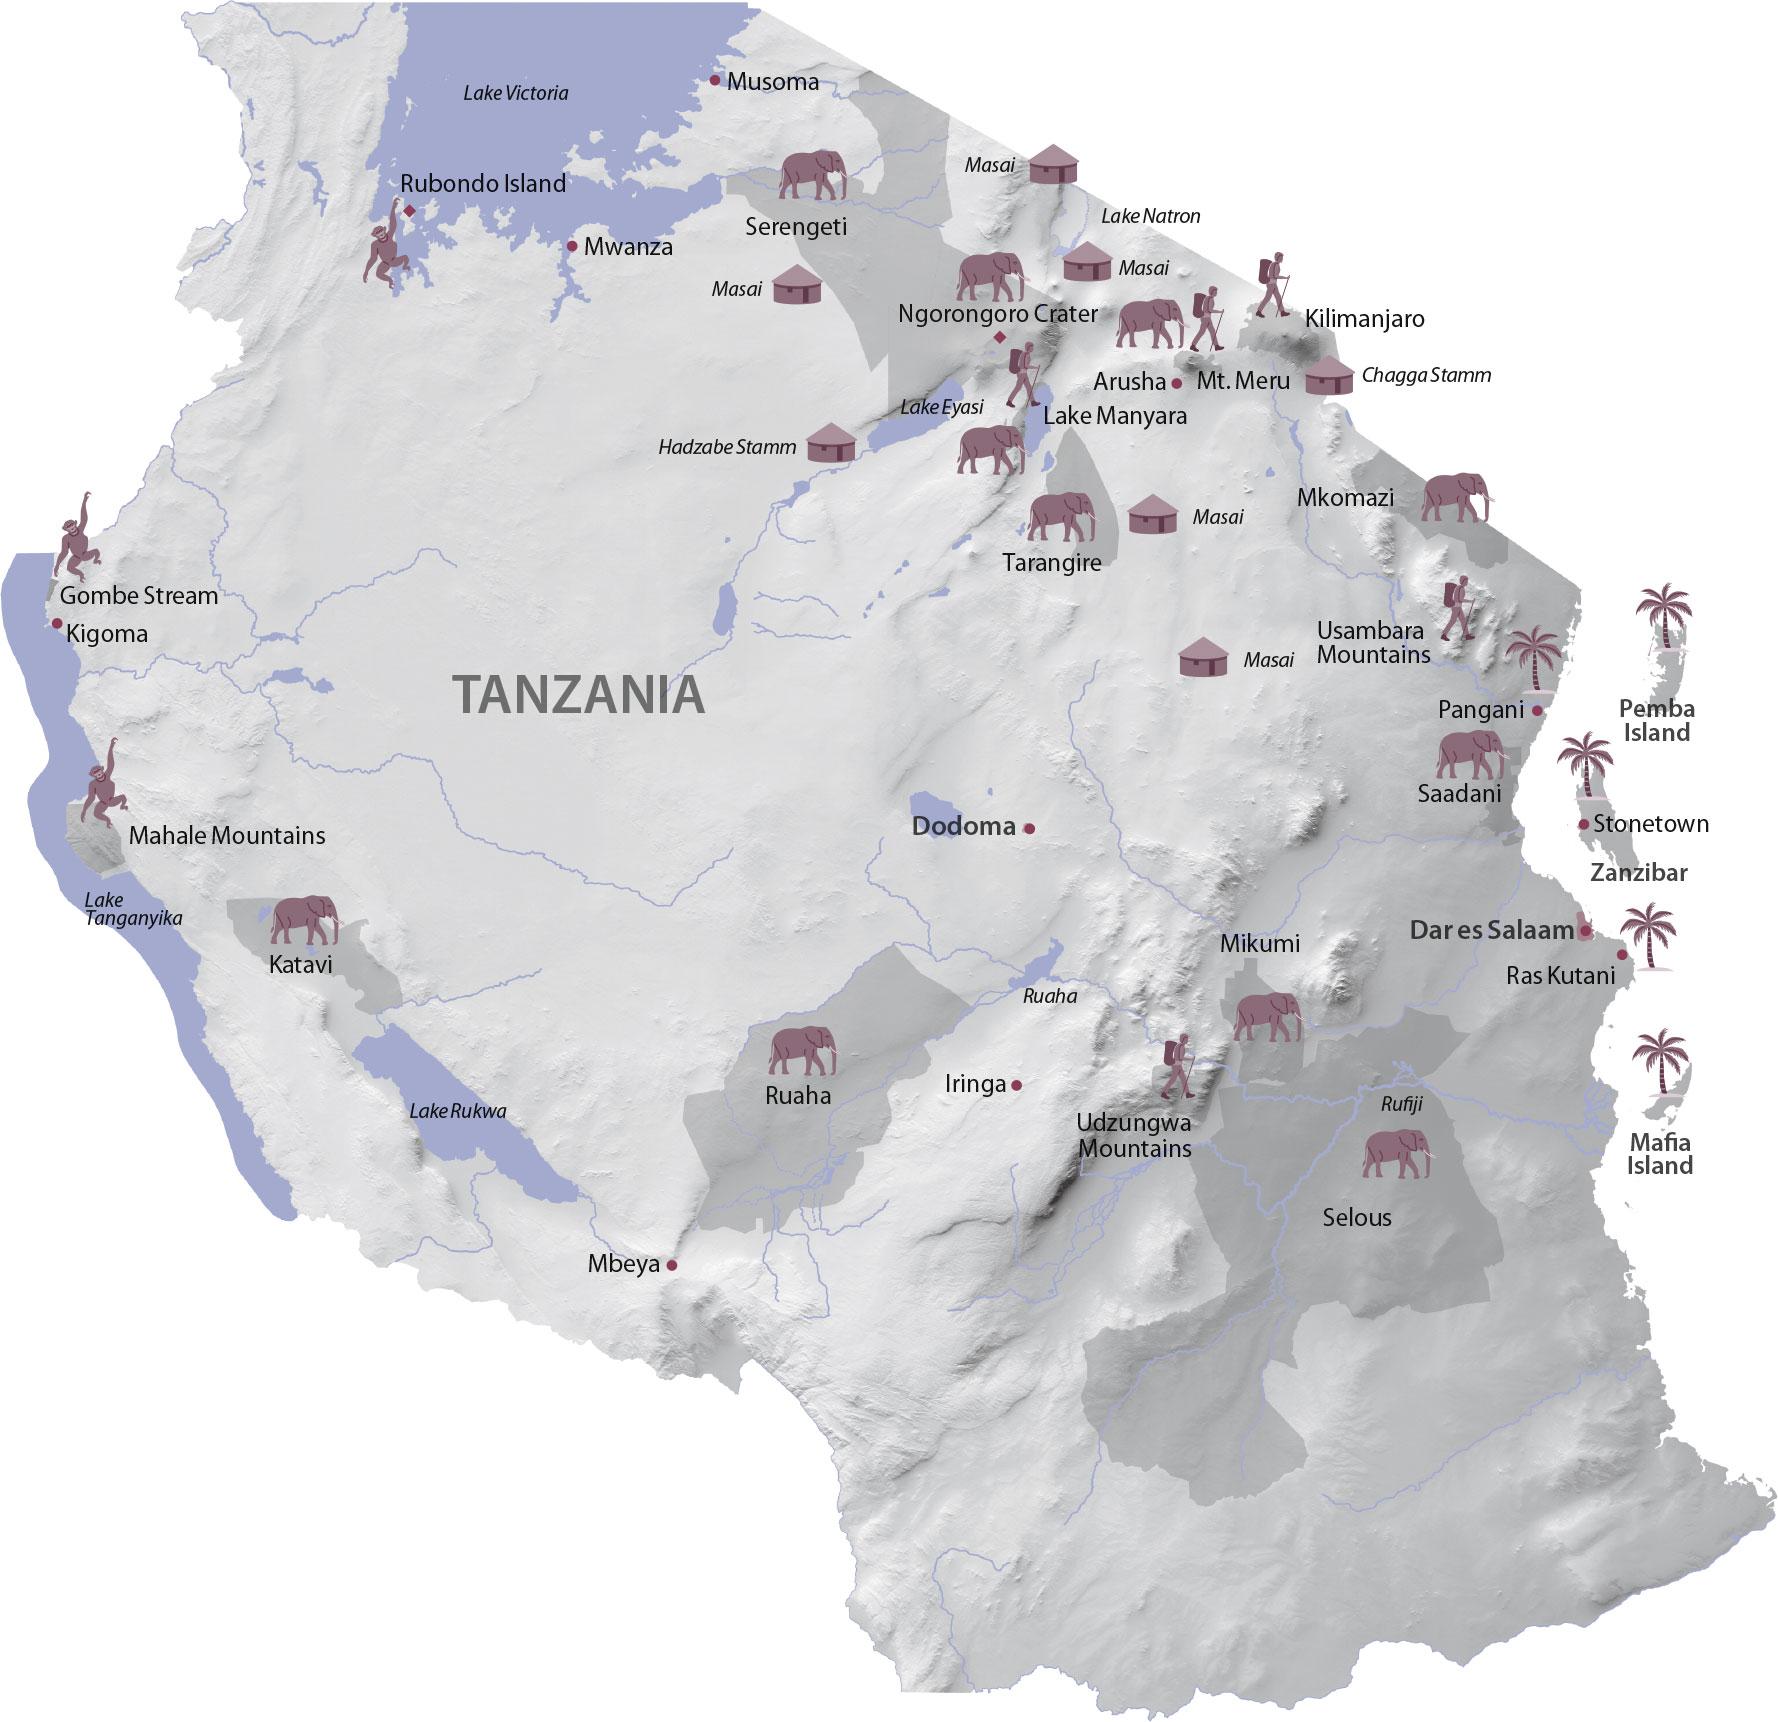 Karte Tanzania Regionen